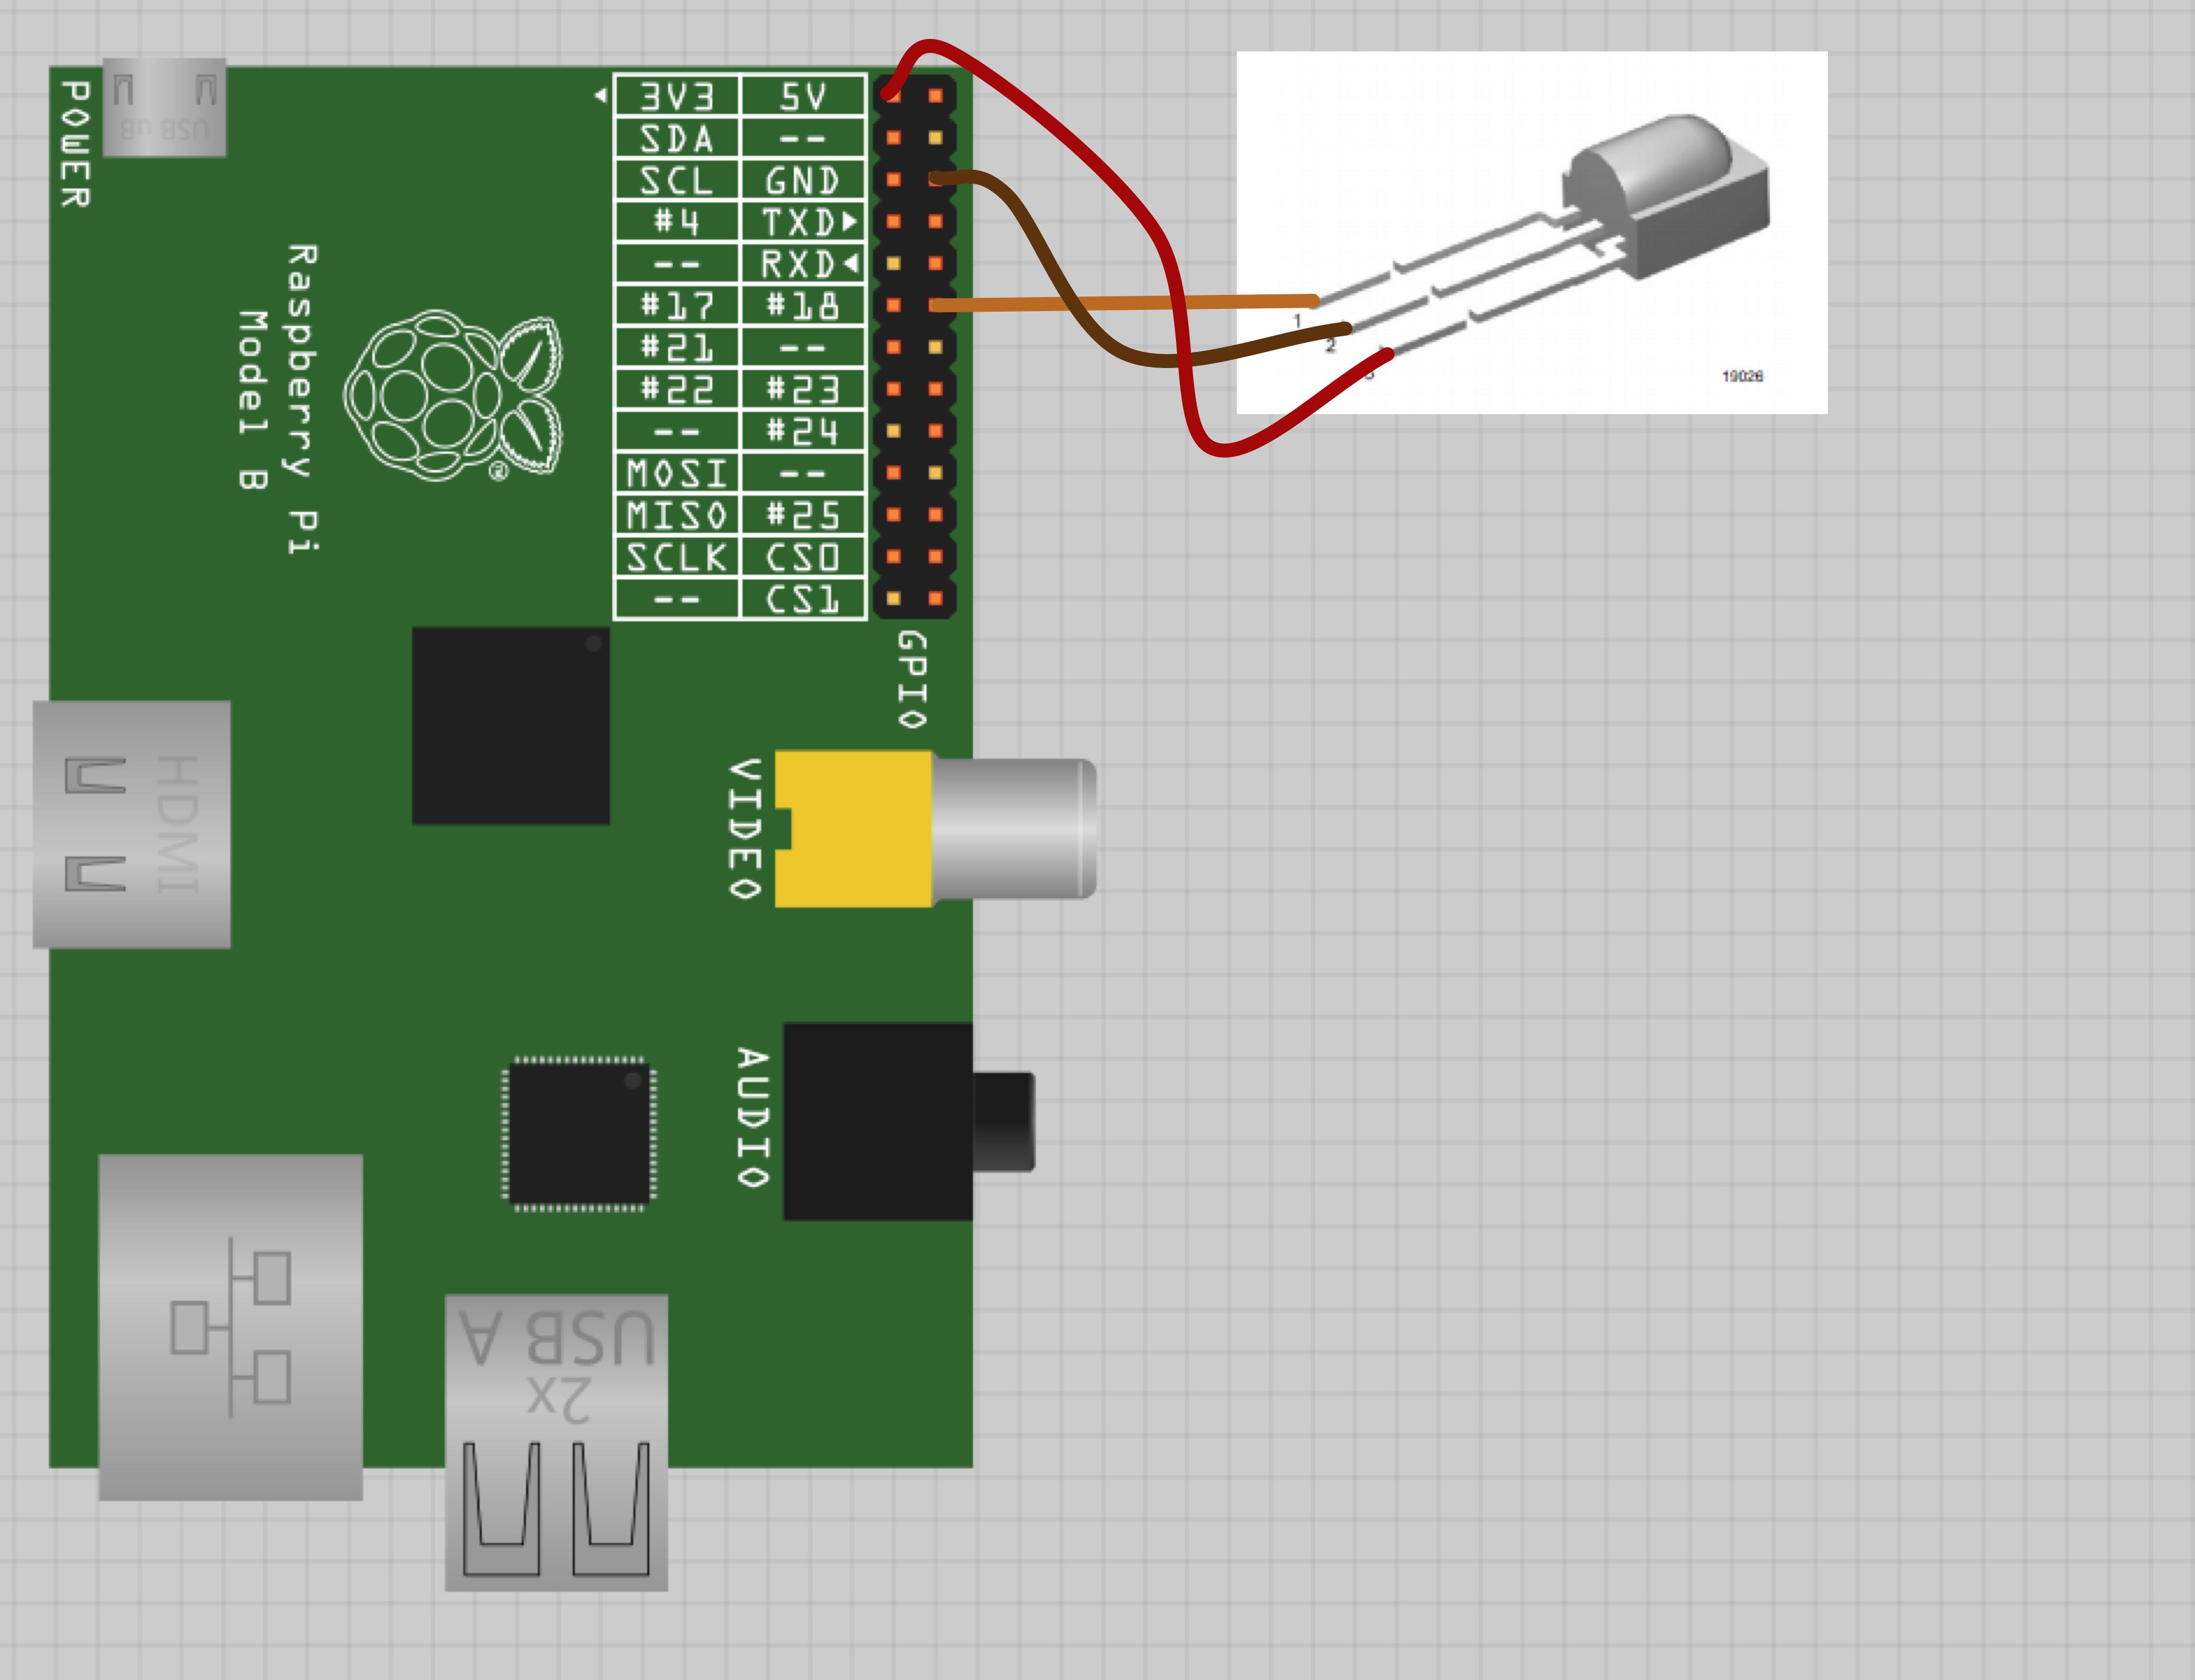 raspberry_pi_wiring.png